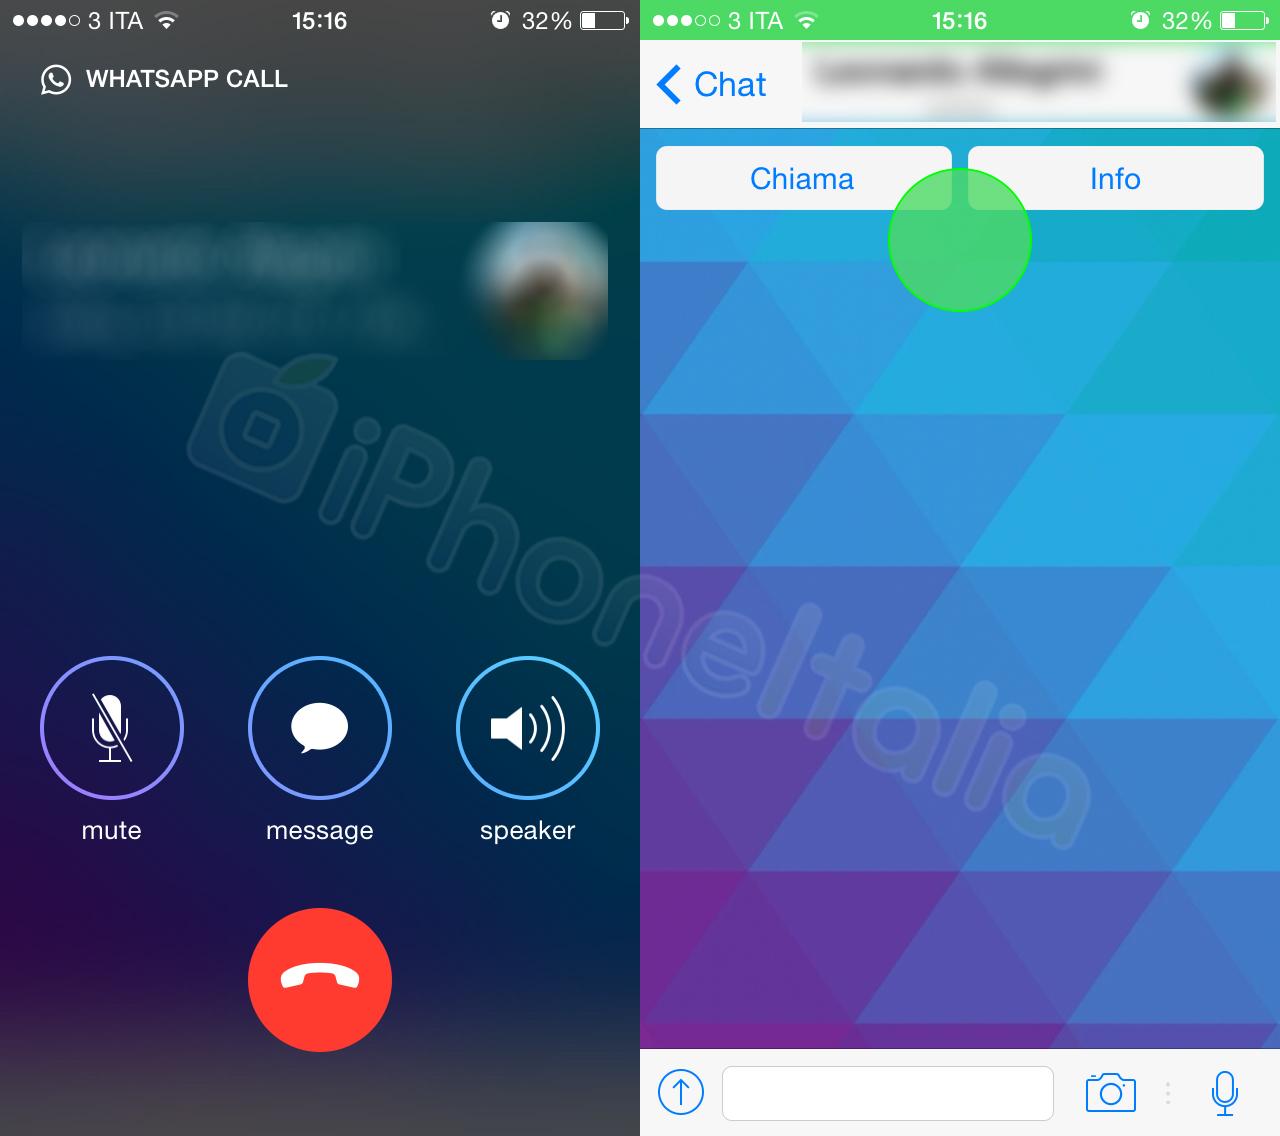 WhatsApp's VoIP